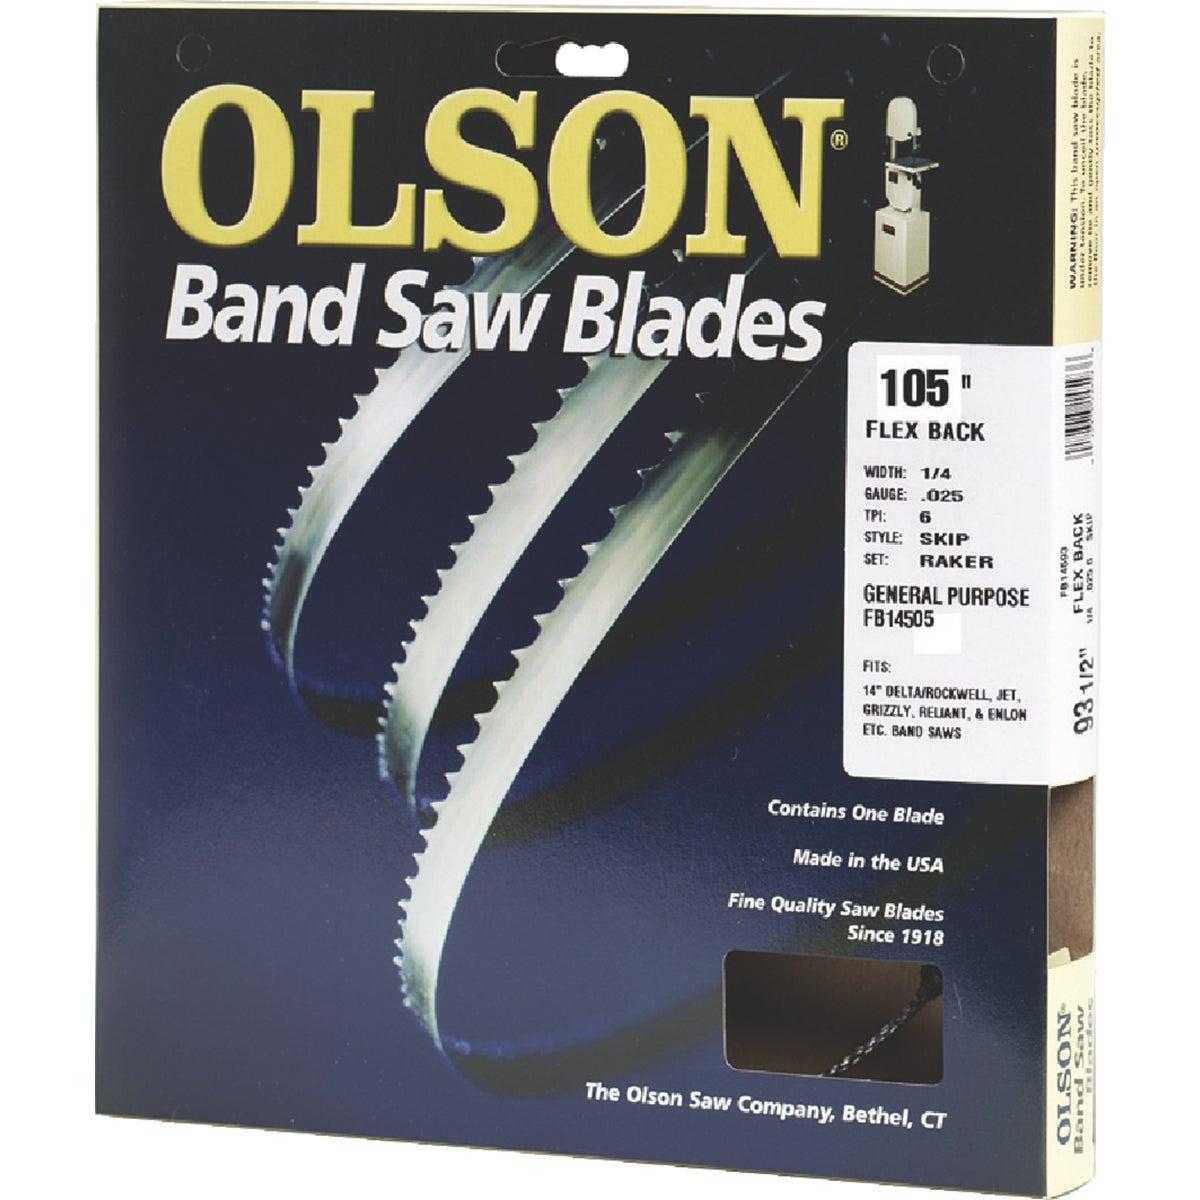 "105"" BANDSAW BLADE - 14505 by Olson Saw Co"